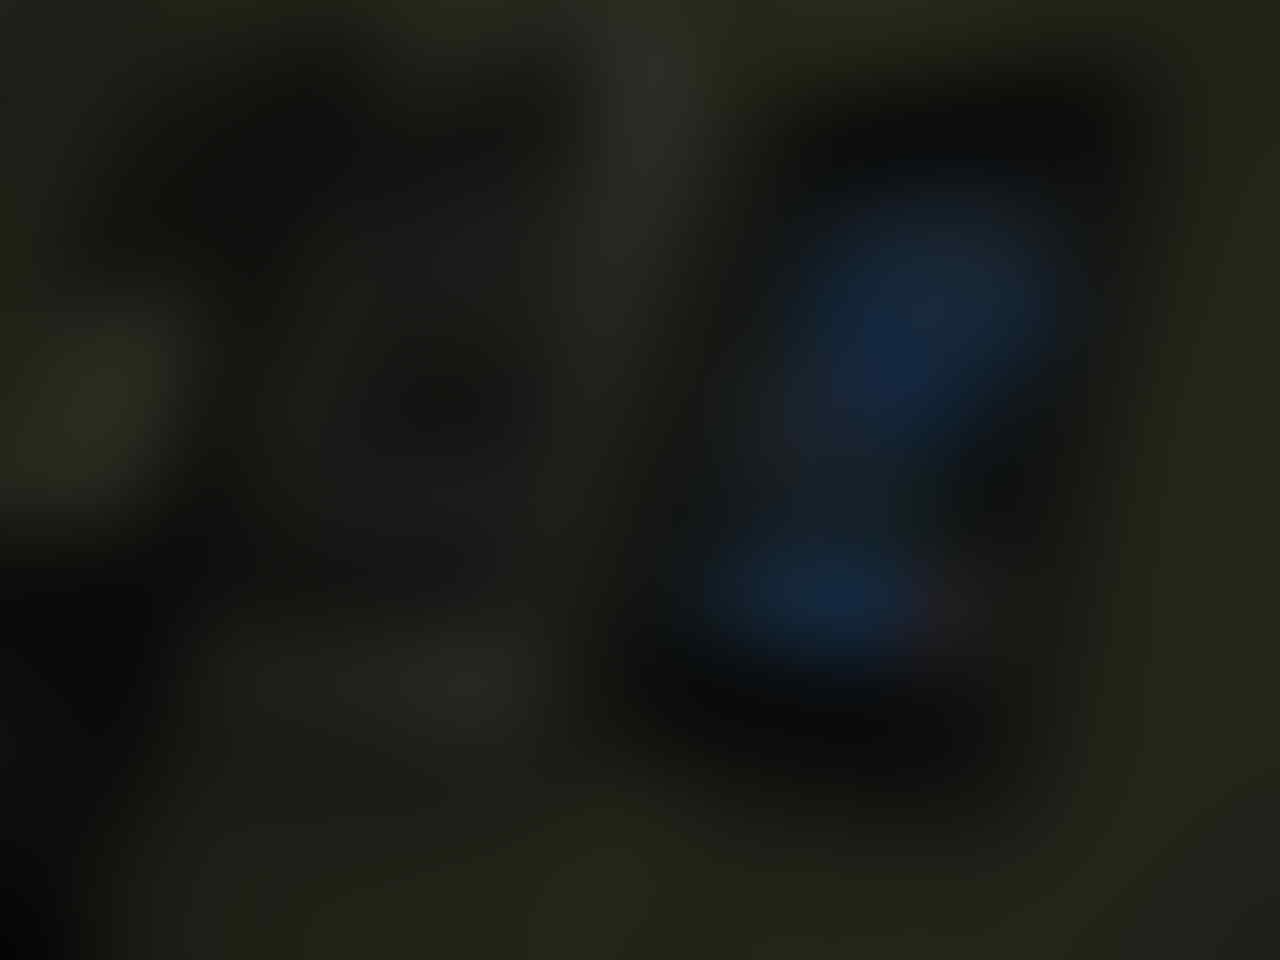 BANTAI Ipod Touch 2nd gen bisa rekber pastinyaa